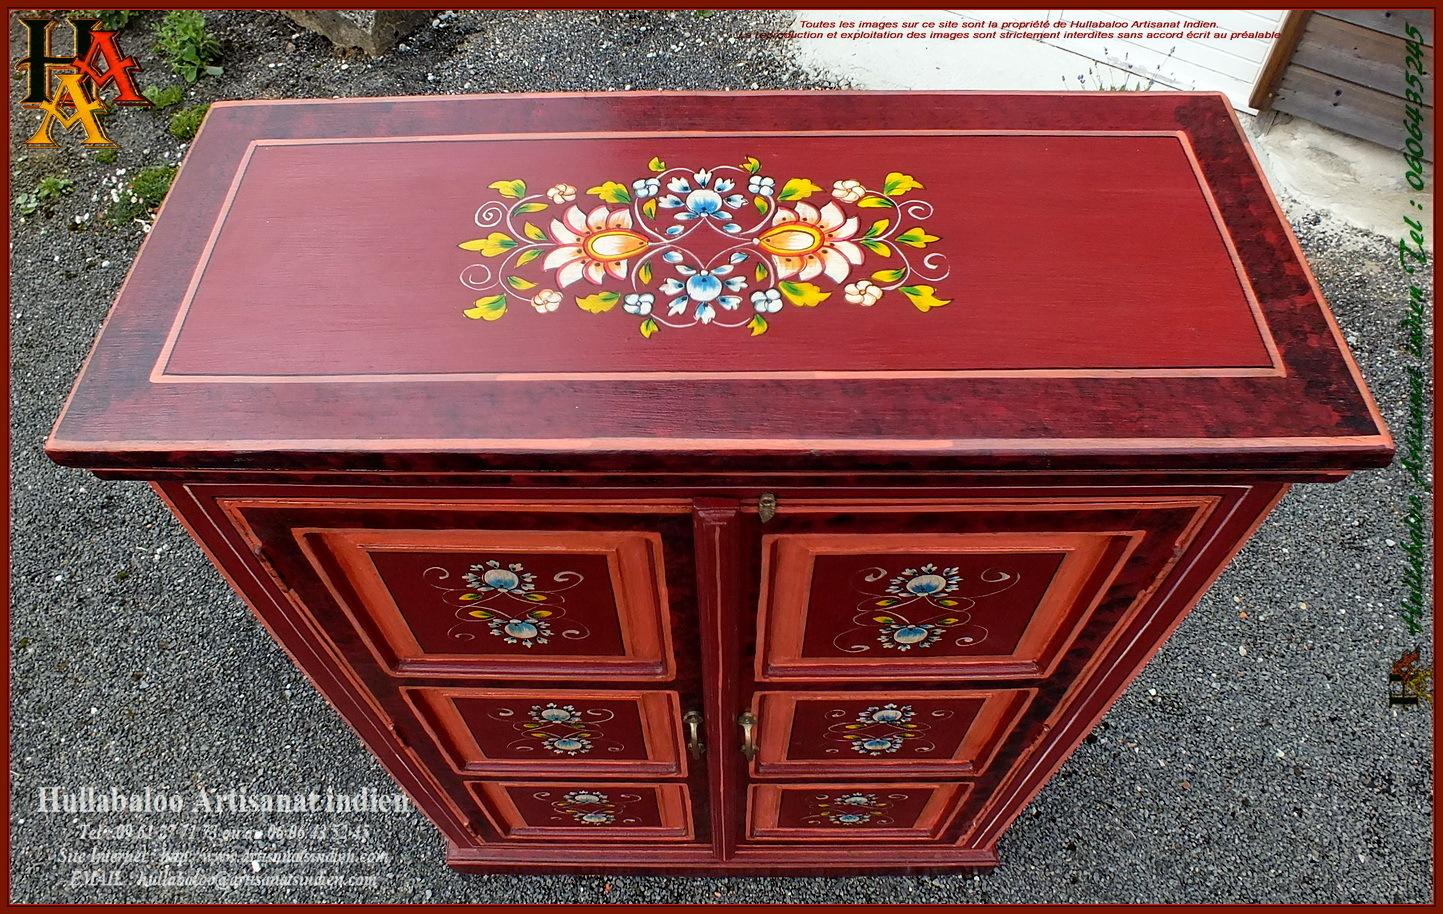 armoire peinte jn11 lilt317